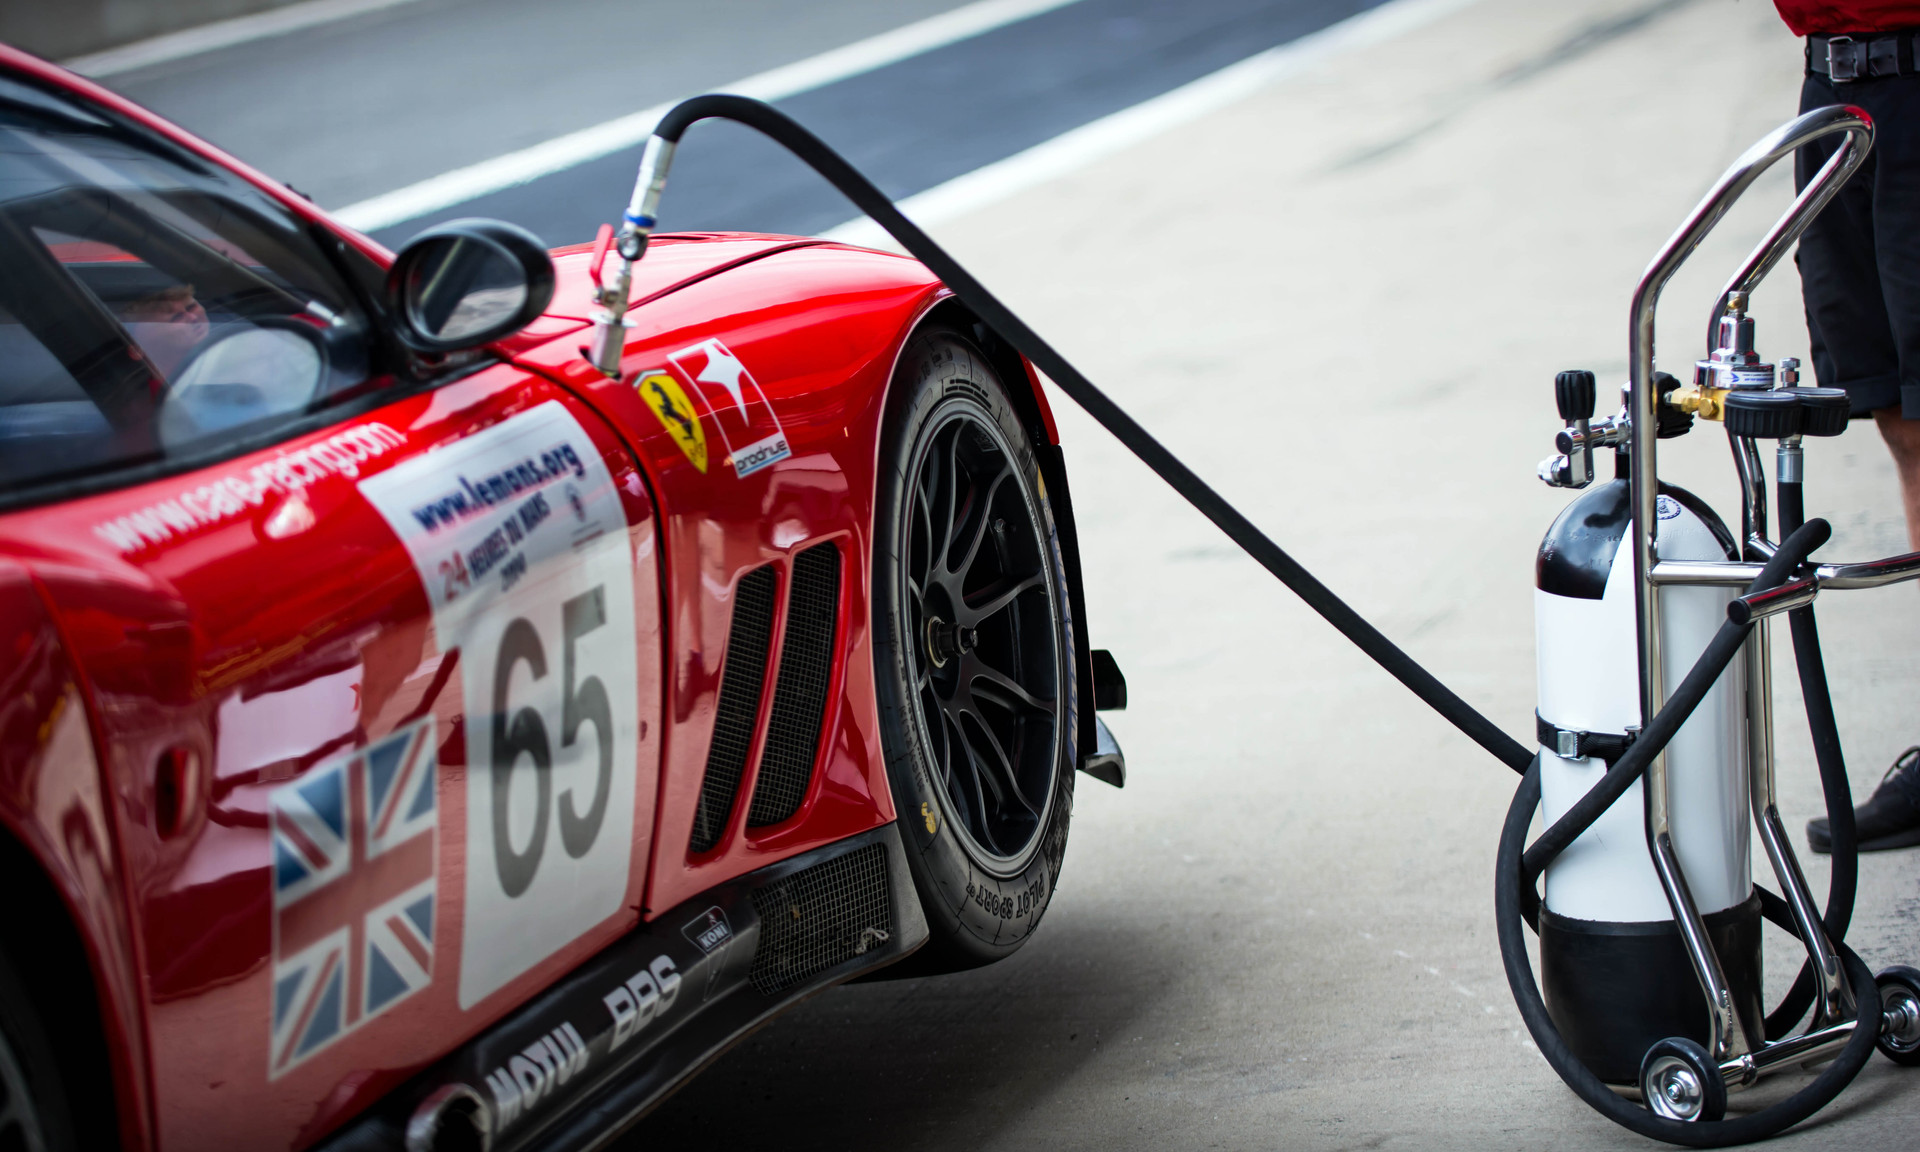 James Cottingham's Ferrari 550 GT1